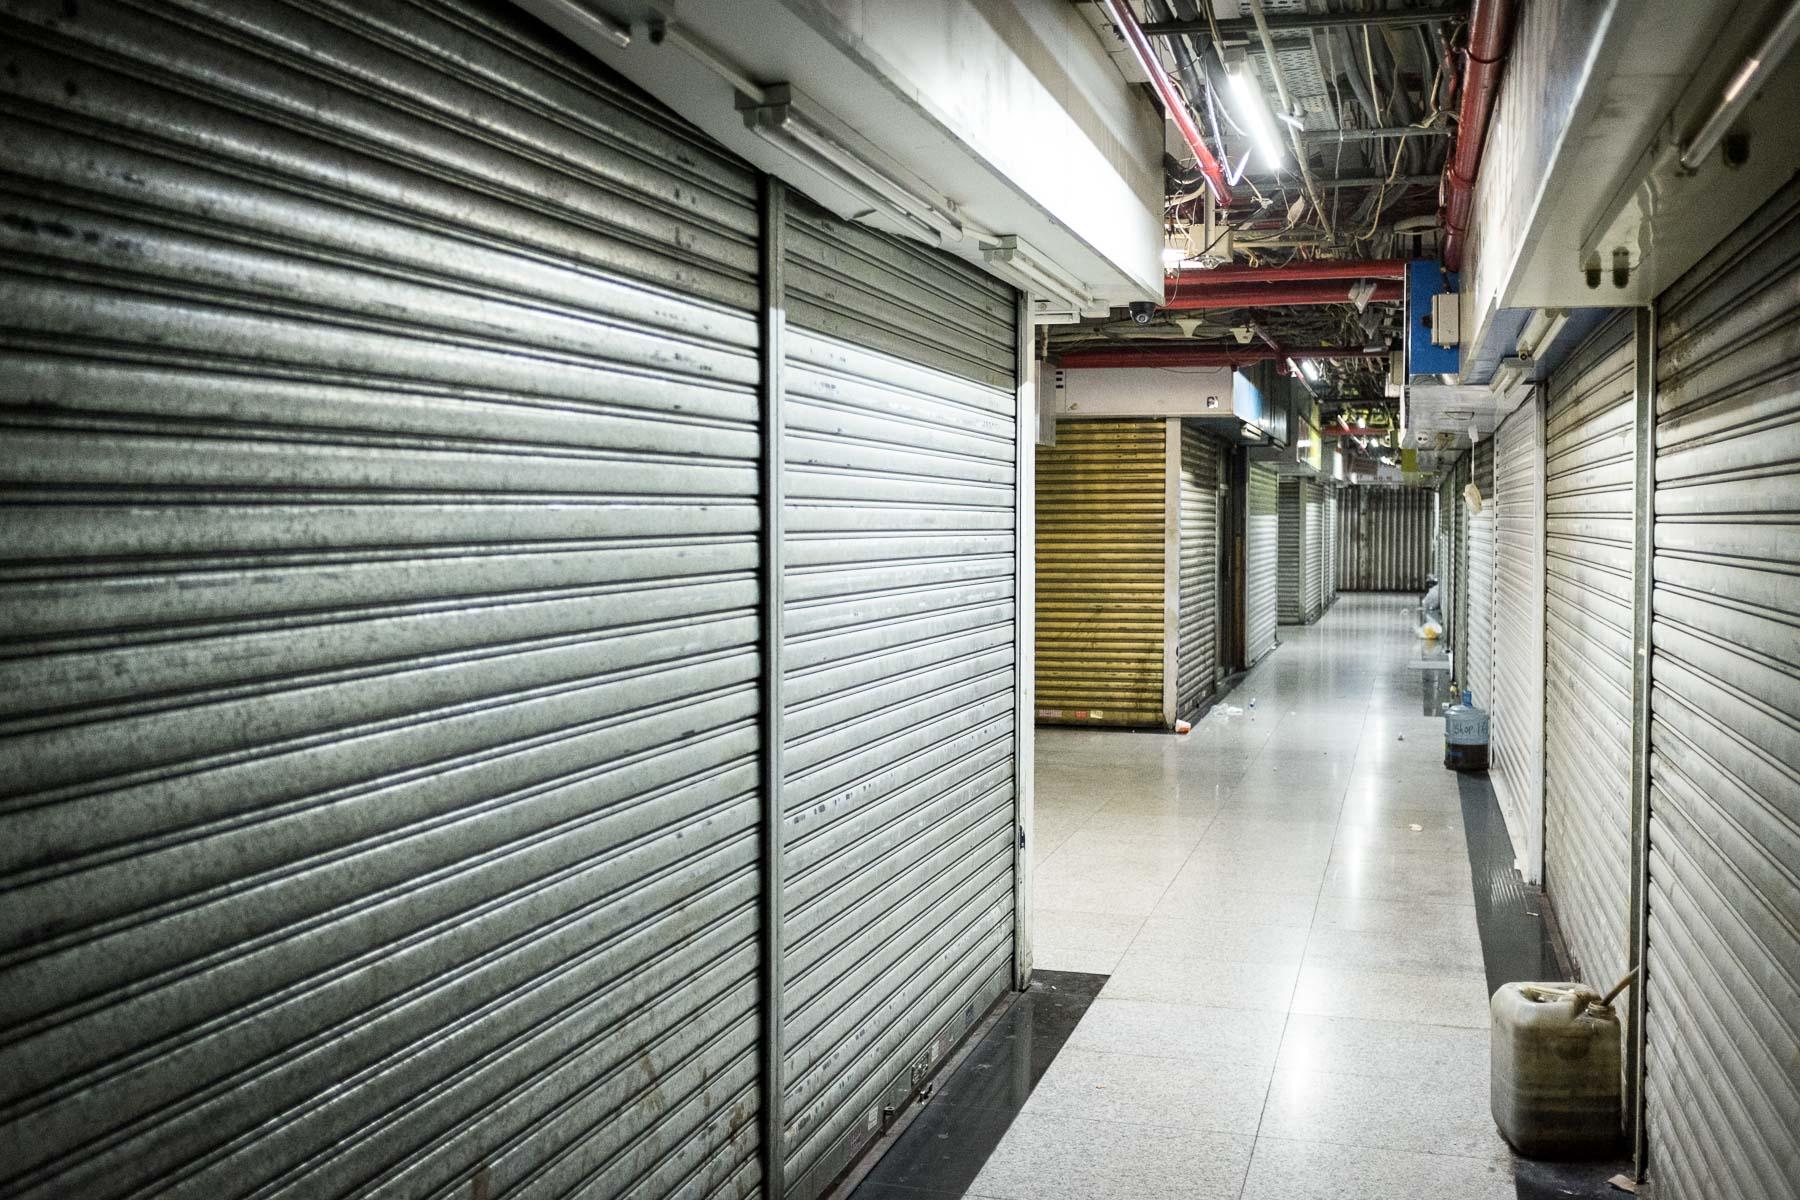 Chungking Mansions Hallway